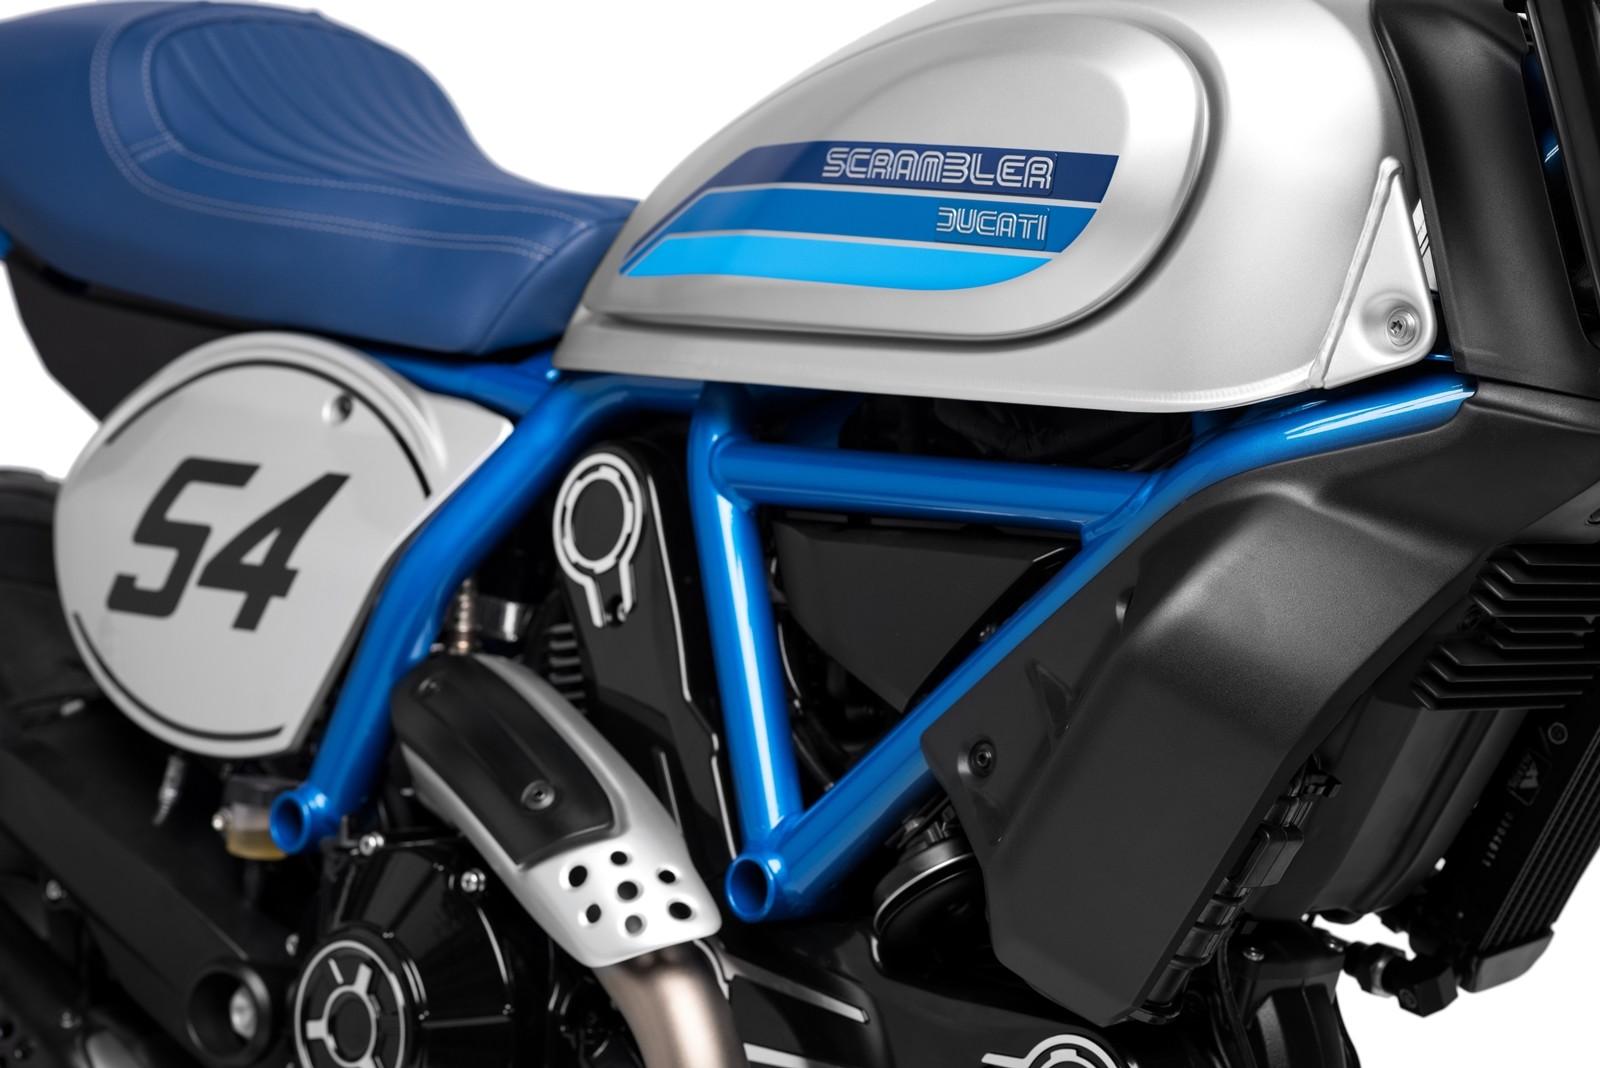 Foto de Ducati Scrambler Café Racer 2019 (11/31)